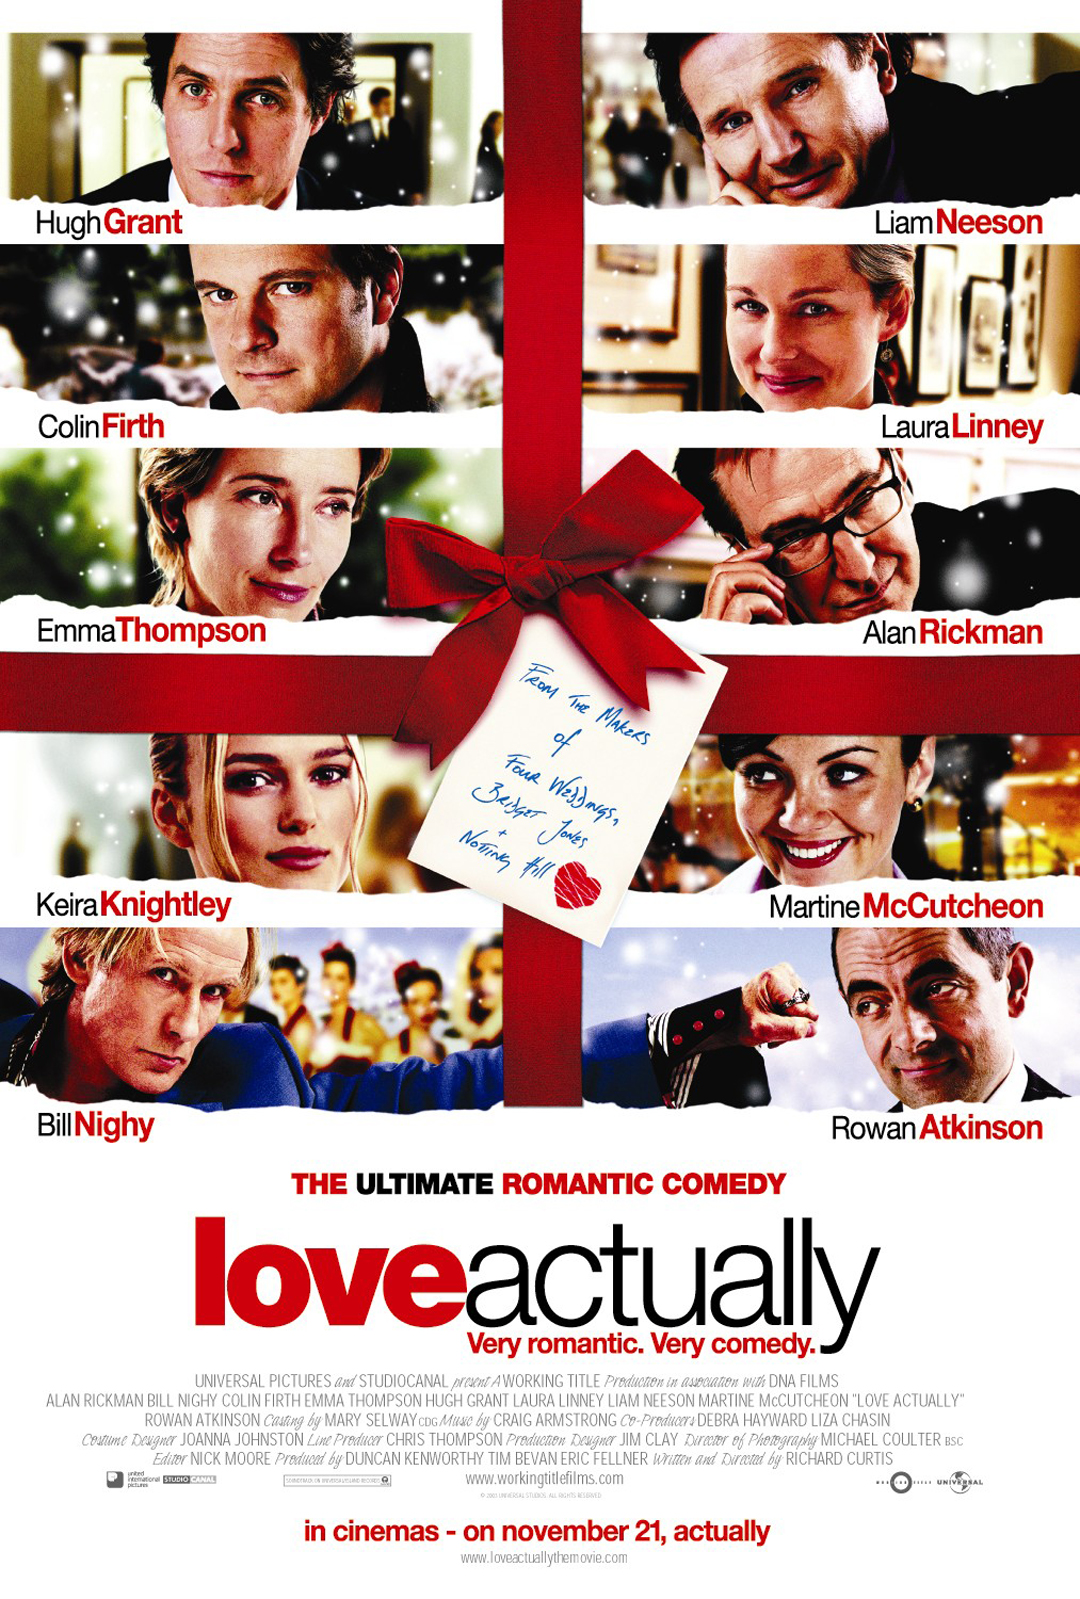 http://2.bp.blogspot.com/-jFhCMAHDReE/UM37j9Y3fzI/AAAAAAABG1s/6qMDHFpKspg/s1600/Love-actually-poster.jpg